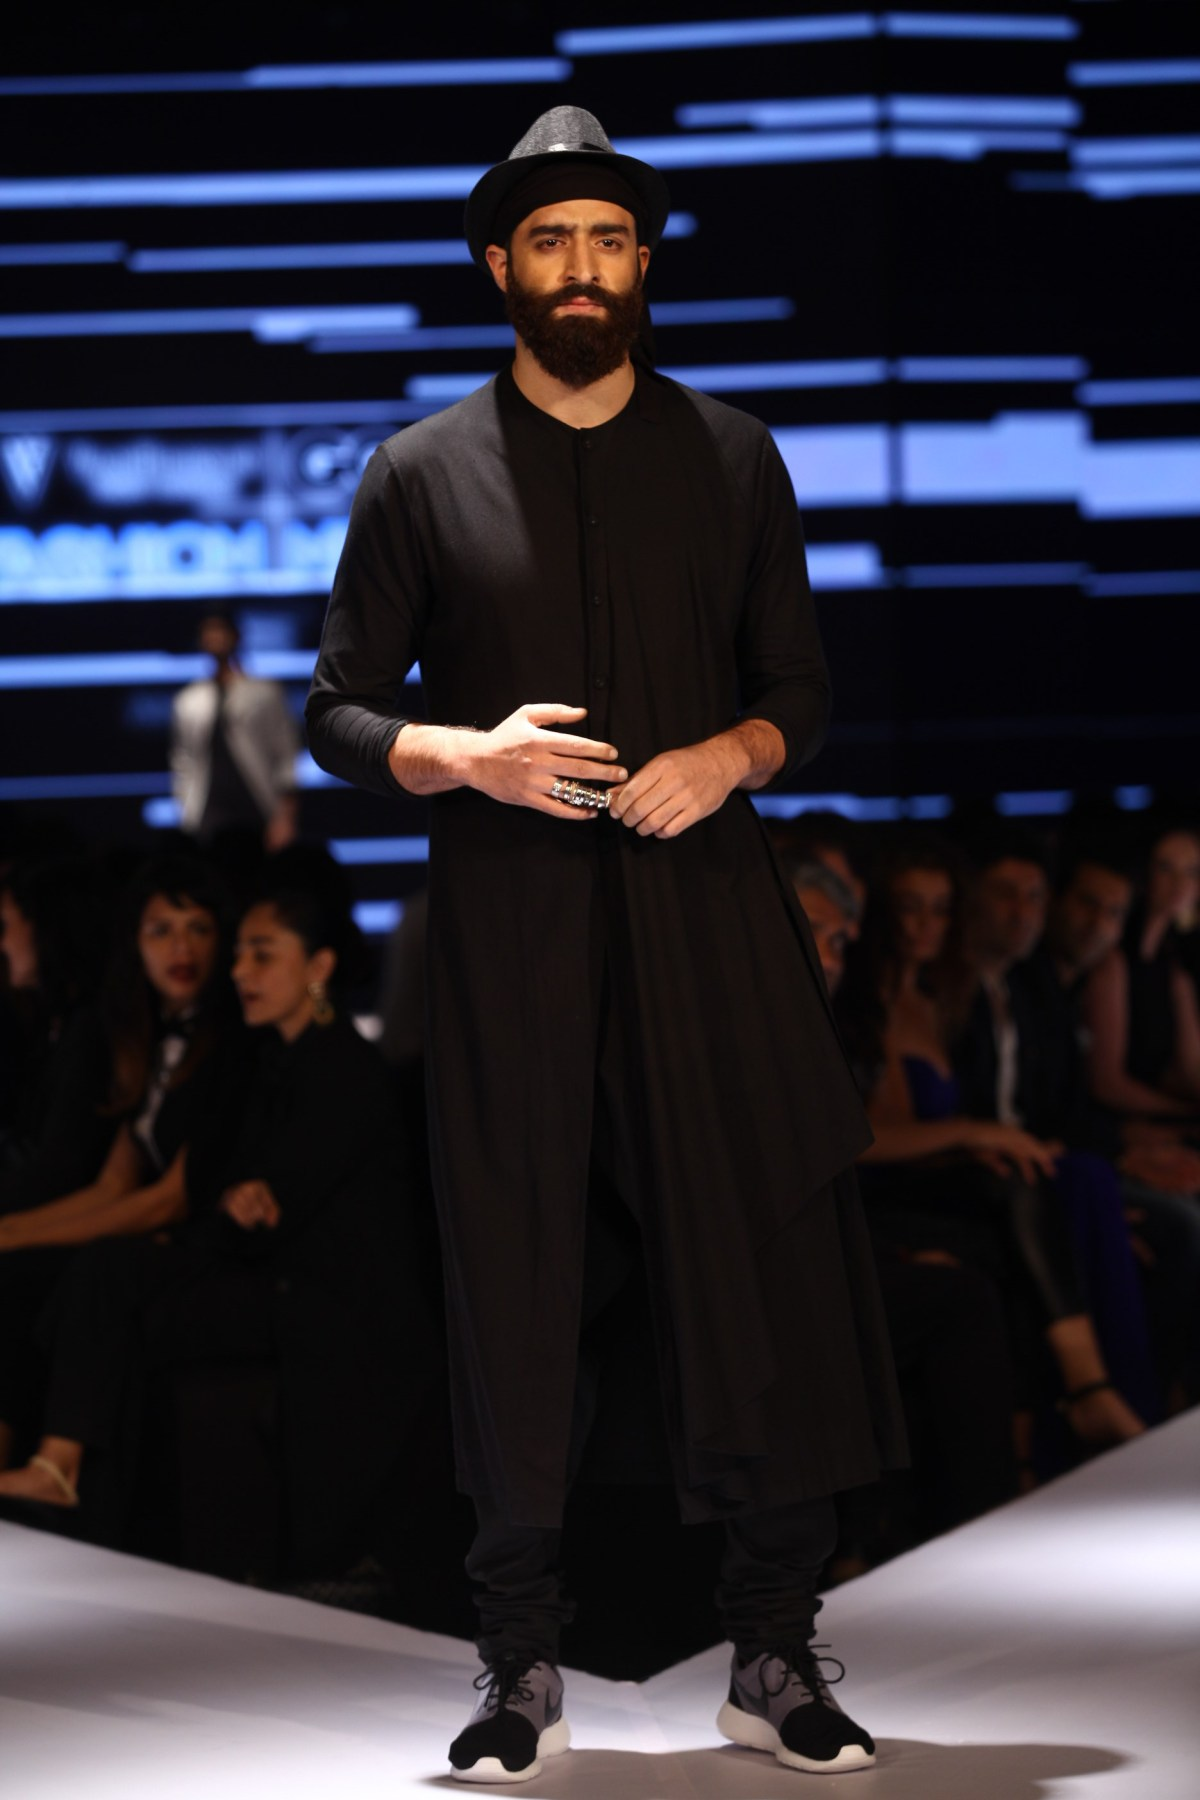 Model in Ujjawal Dubey on Day 2 of Van Heusen + GQ Fashion Nights (1)